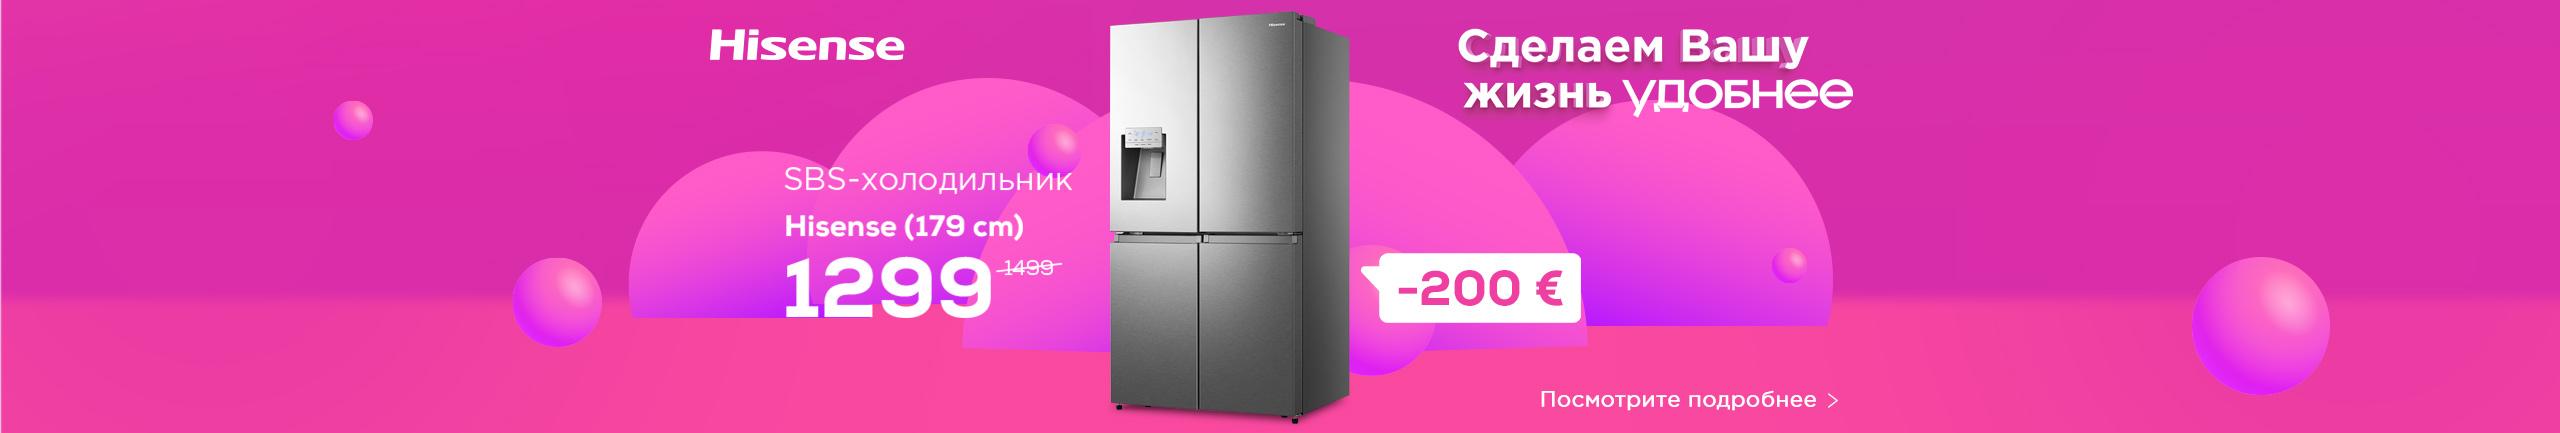 NPL Сделаем Вашу жизнь проще! SBS-холодильник Hisense